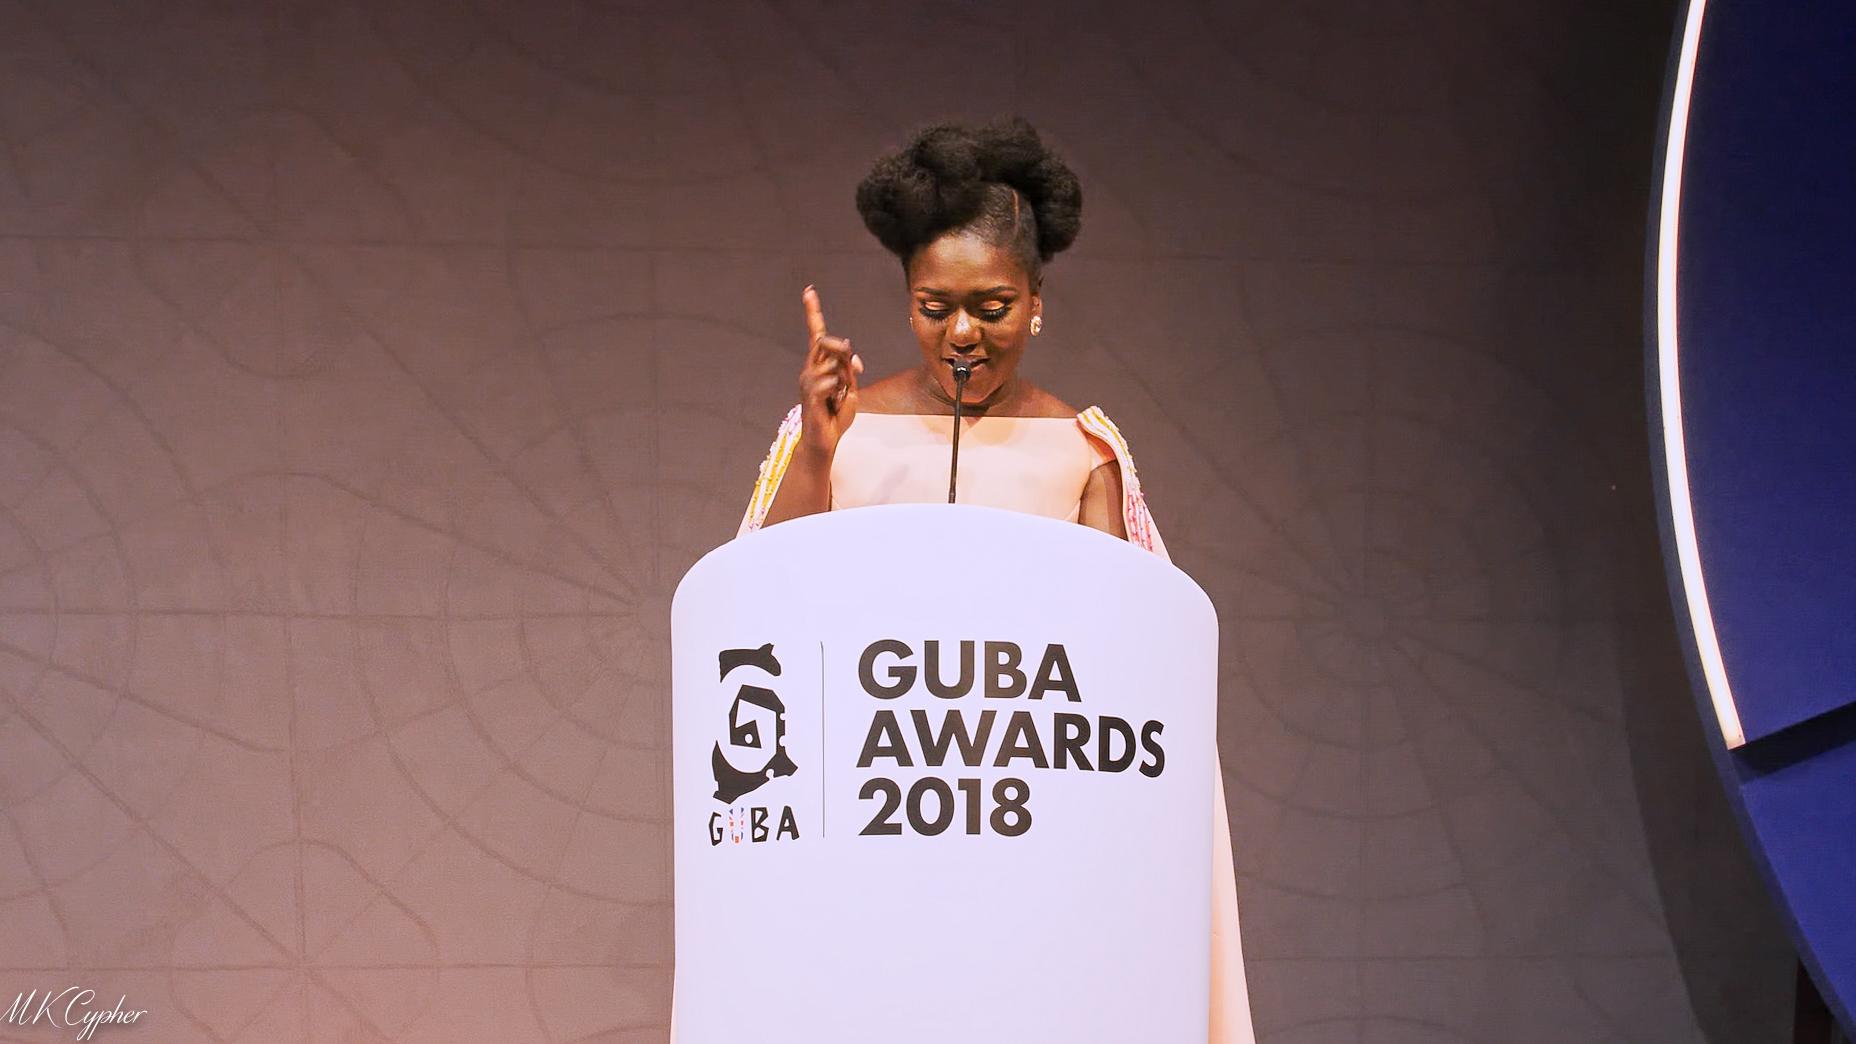 GUBA AWARDS